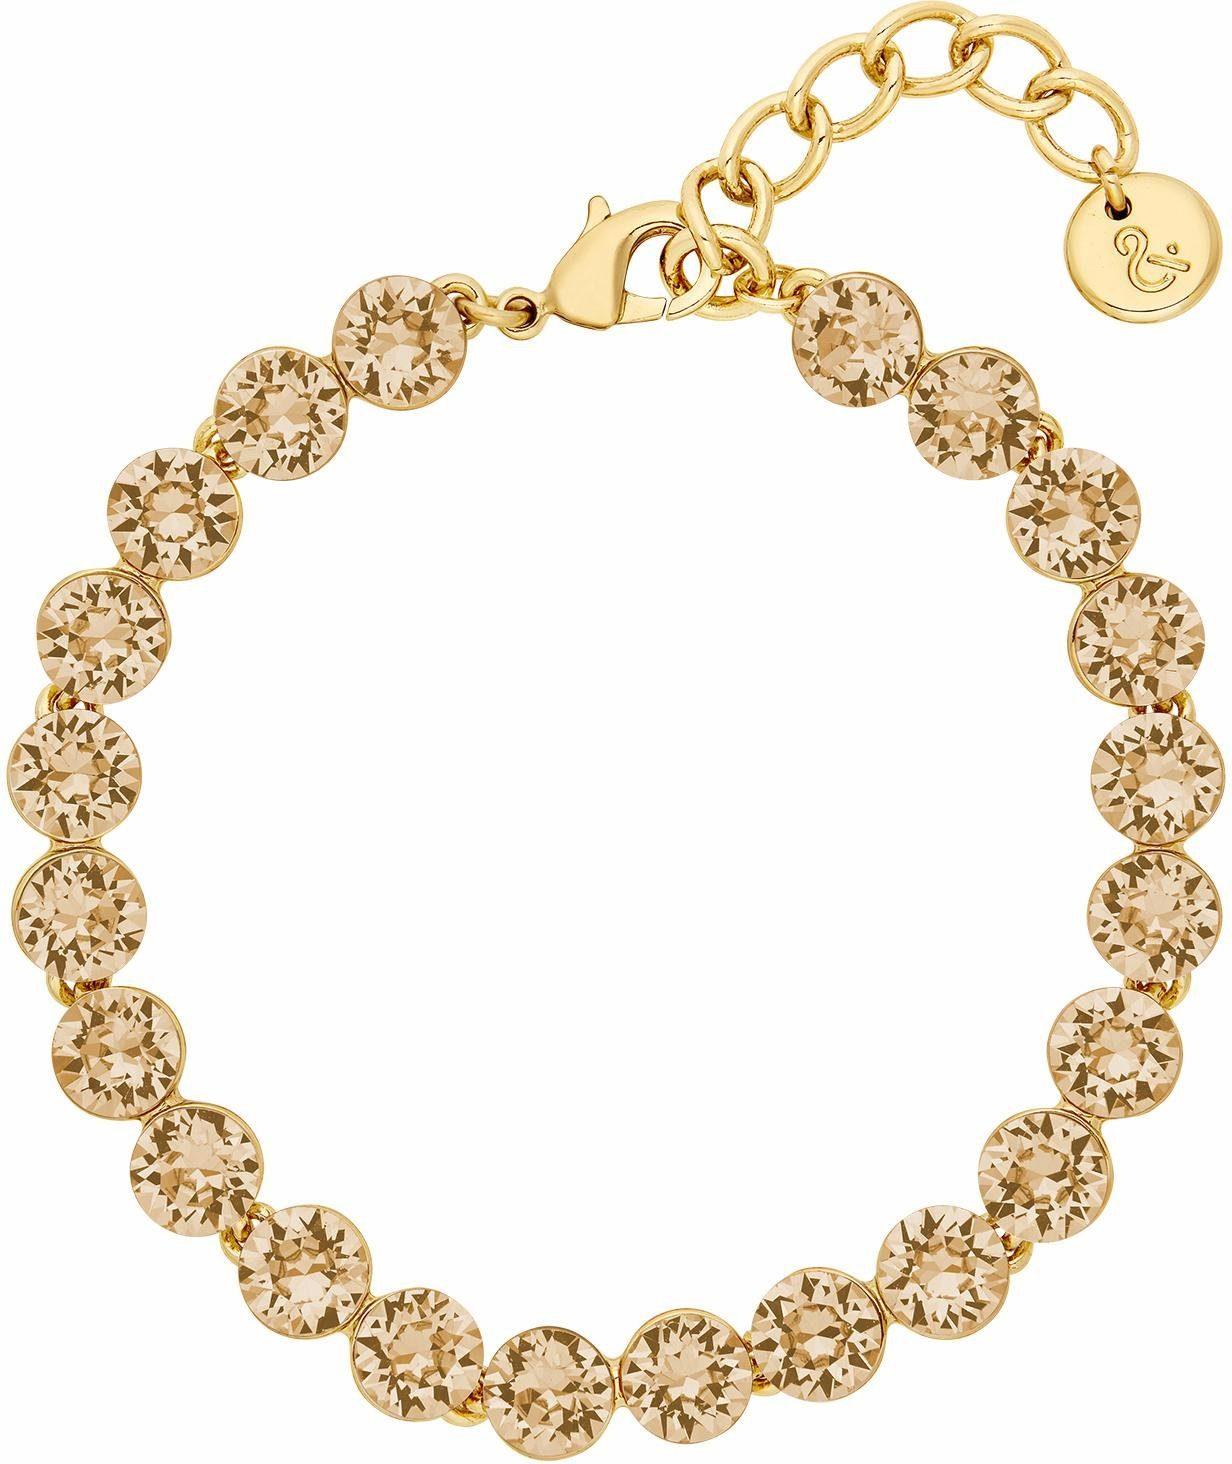 Lolaandgrace Armband »PALACE BRACELET, 5251849«, mit Swarovski® Kristallen